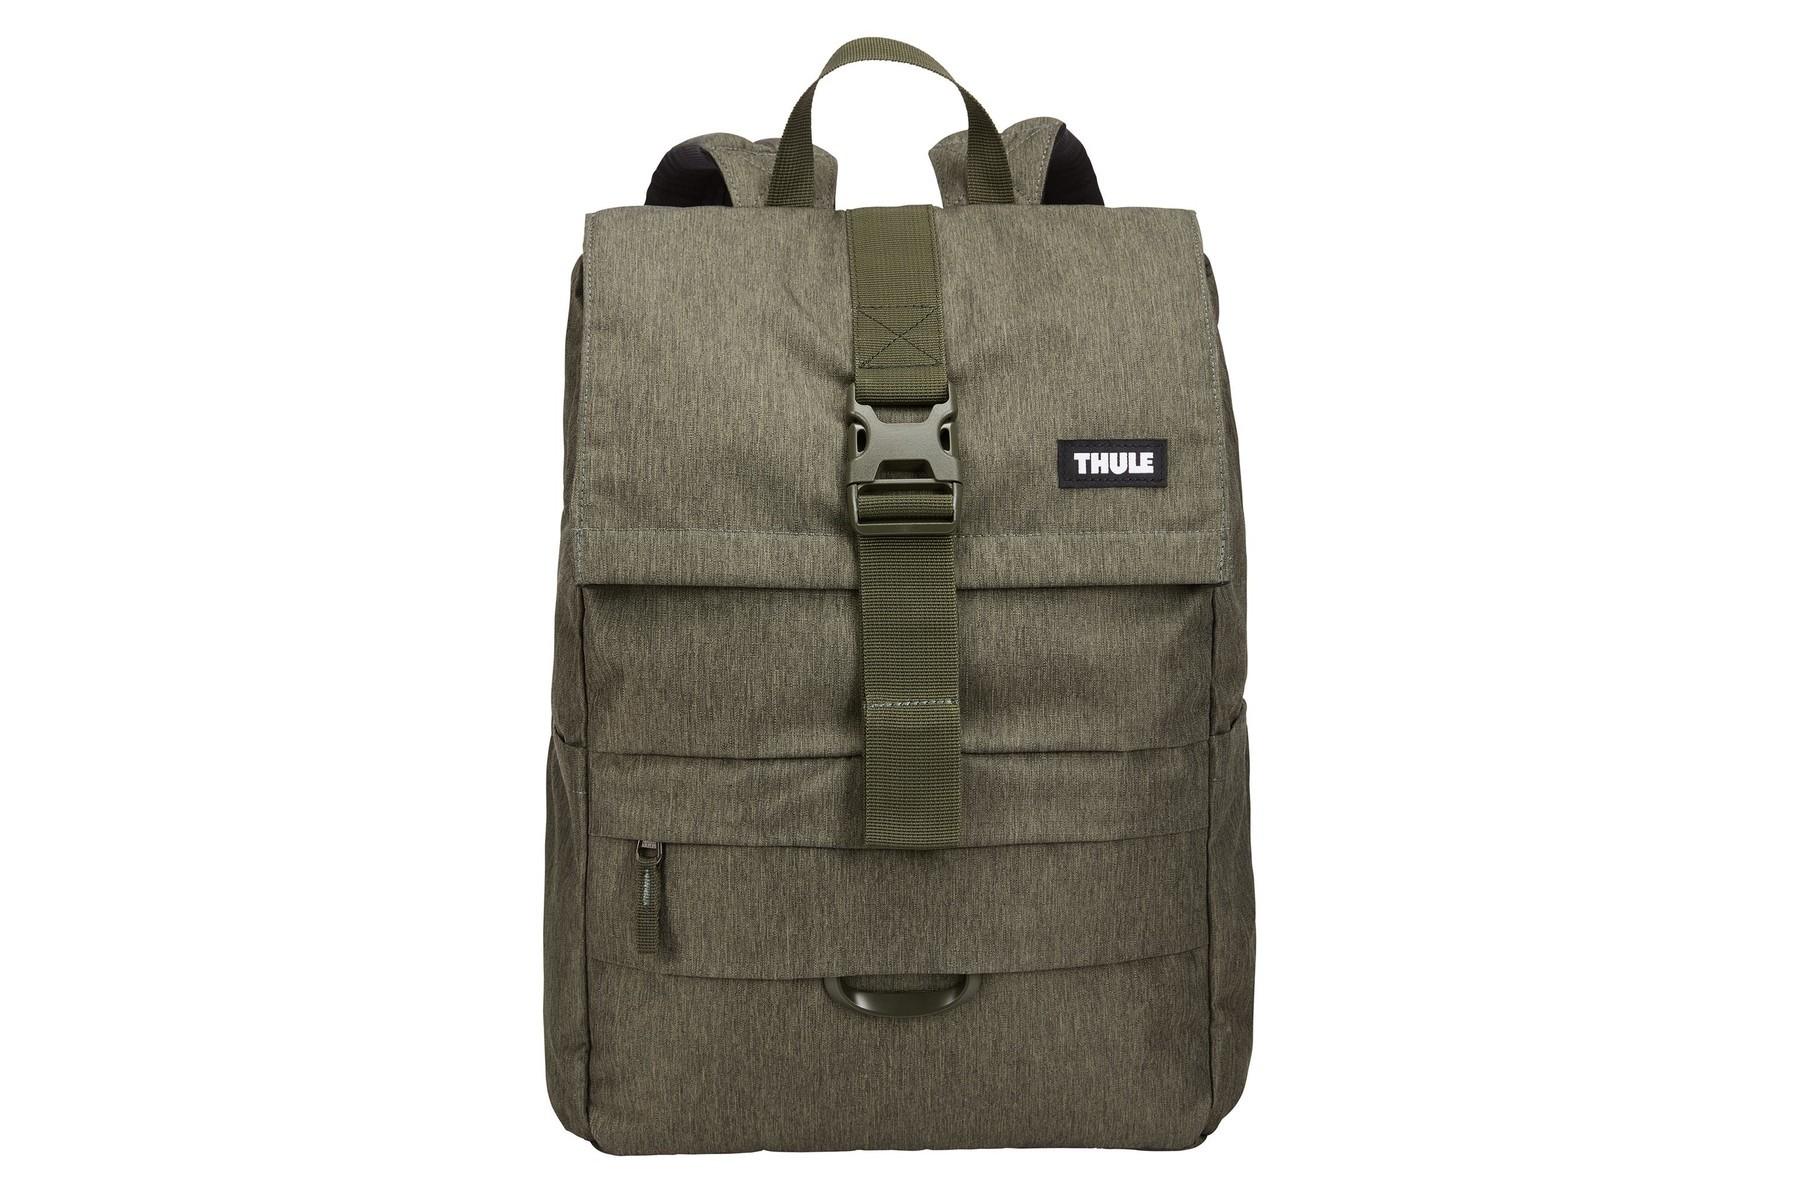 Рюкзак Thule Outset Backpack 22L - купить в официальном ...